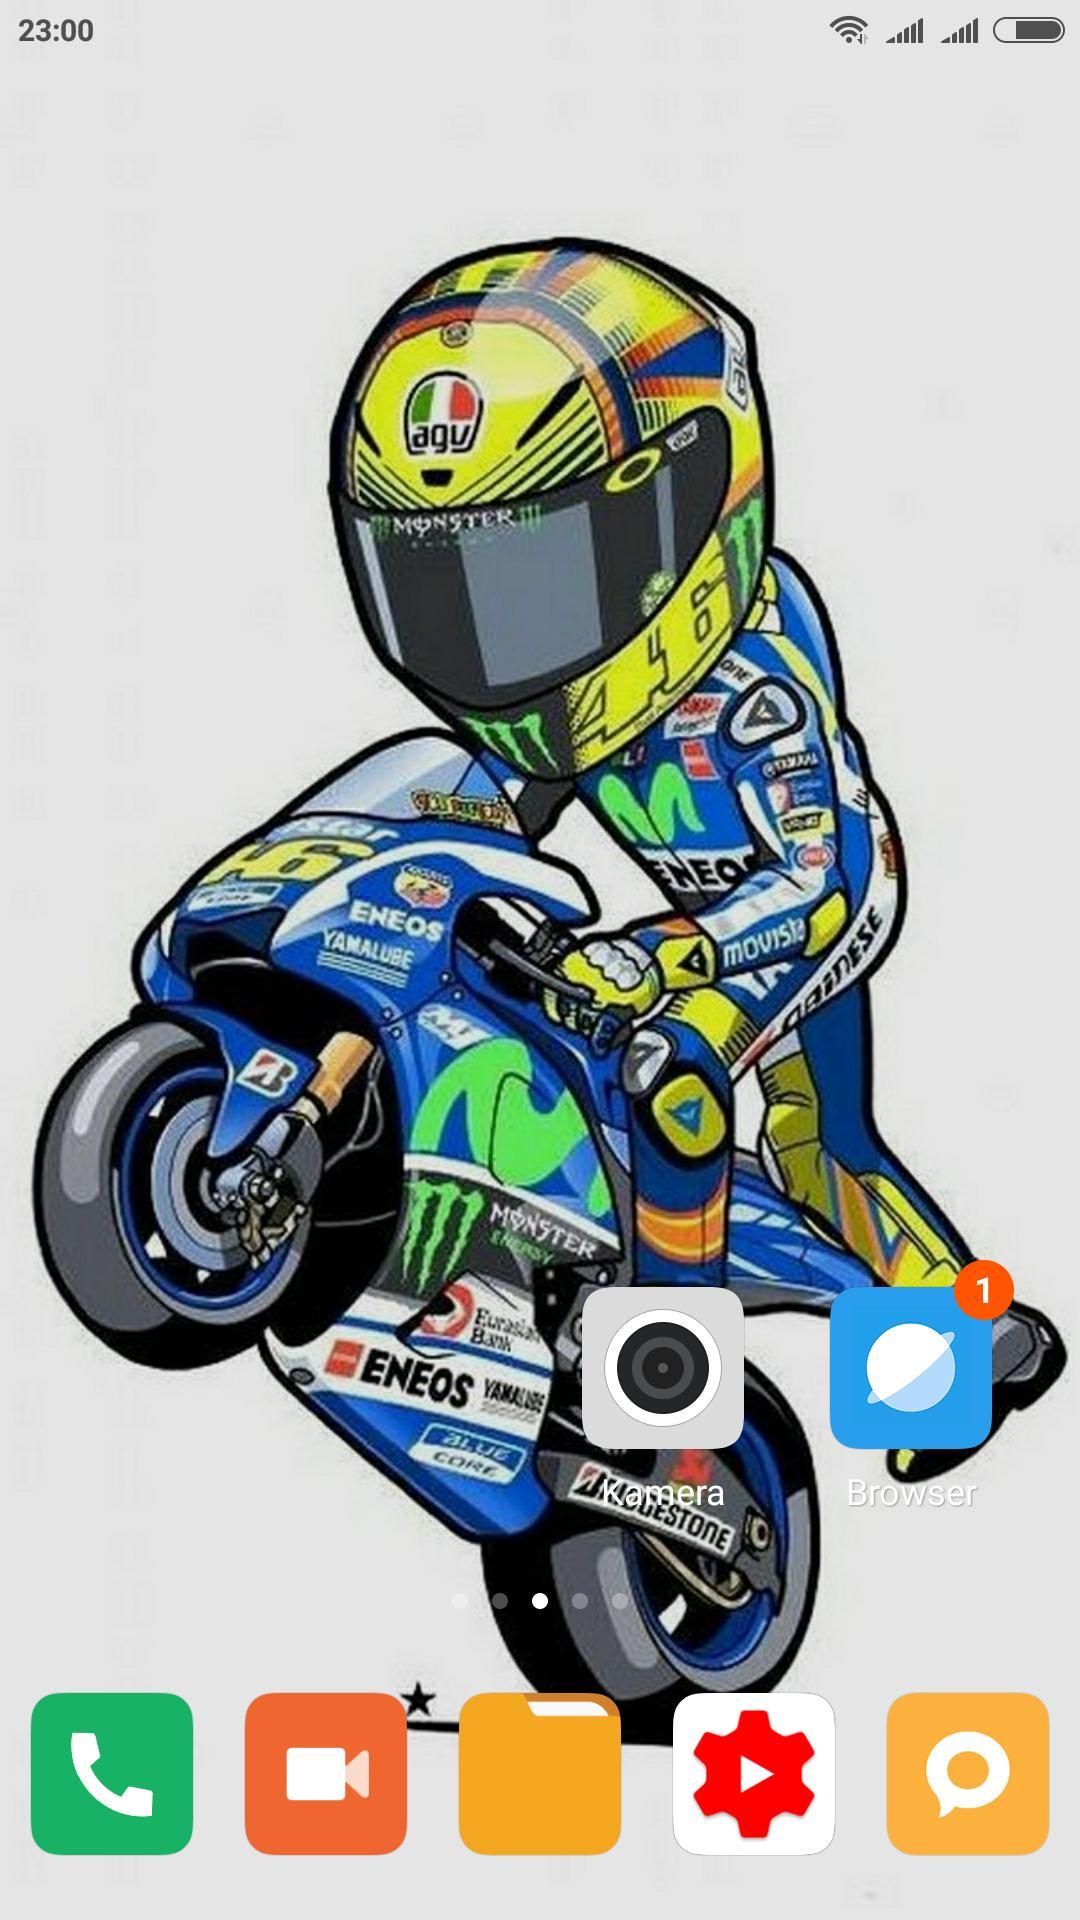 Motogp 2018 Wallpaper Hd For Android Apk Download